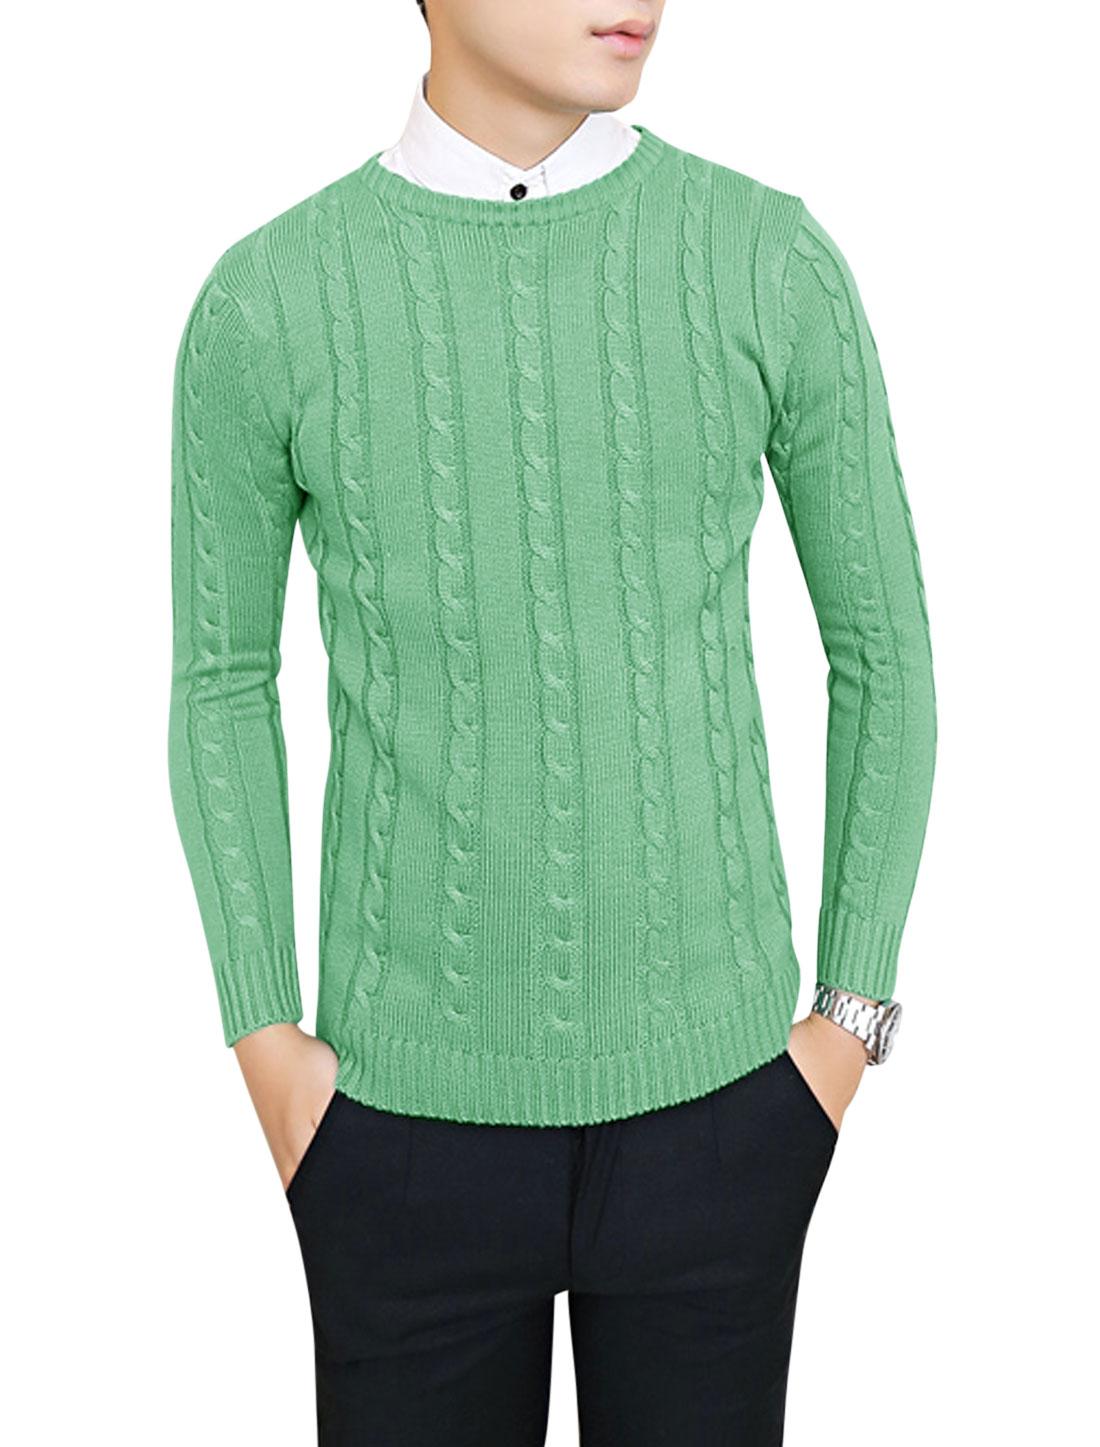 Men Long Sleeve Crew Neck Braided Sweater Light Green S